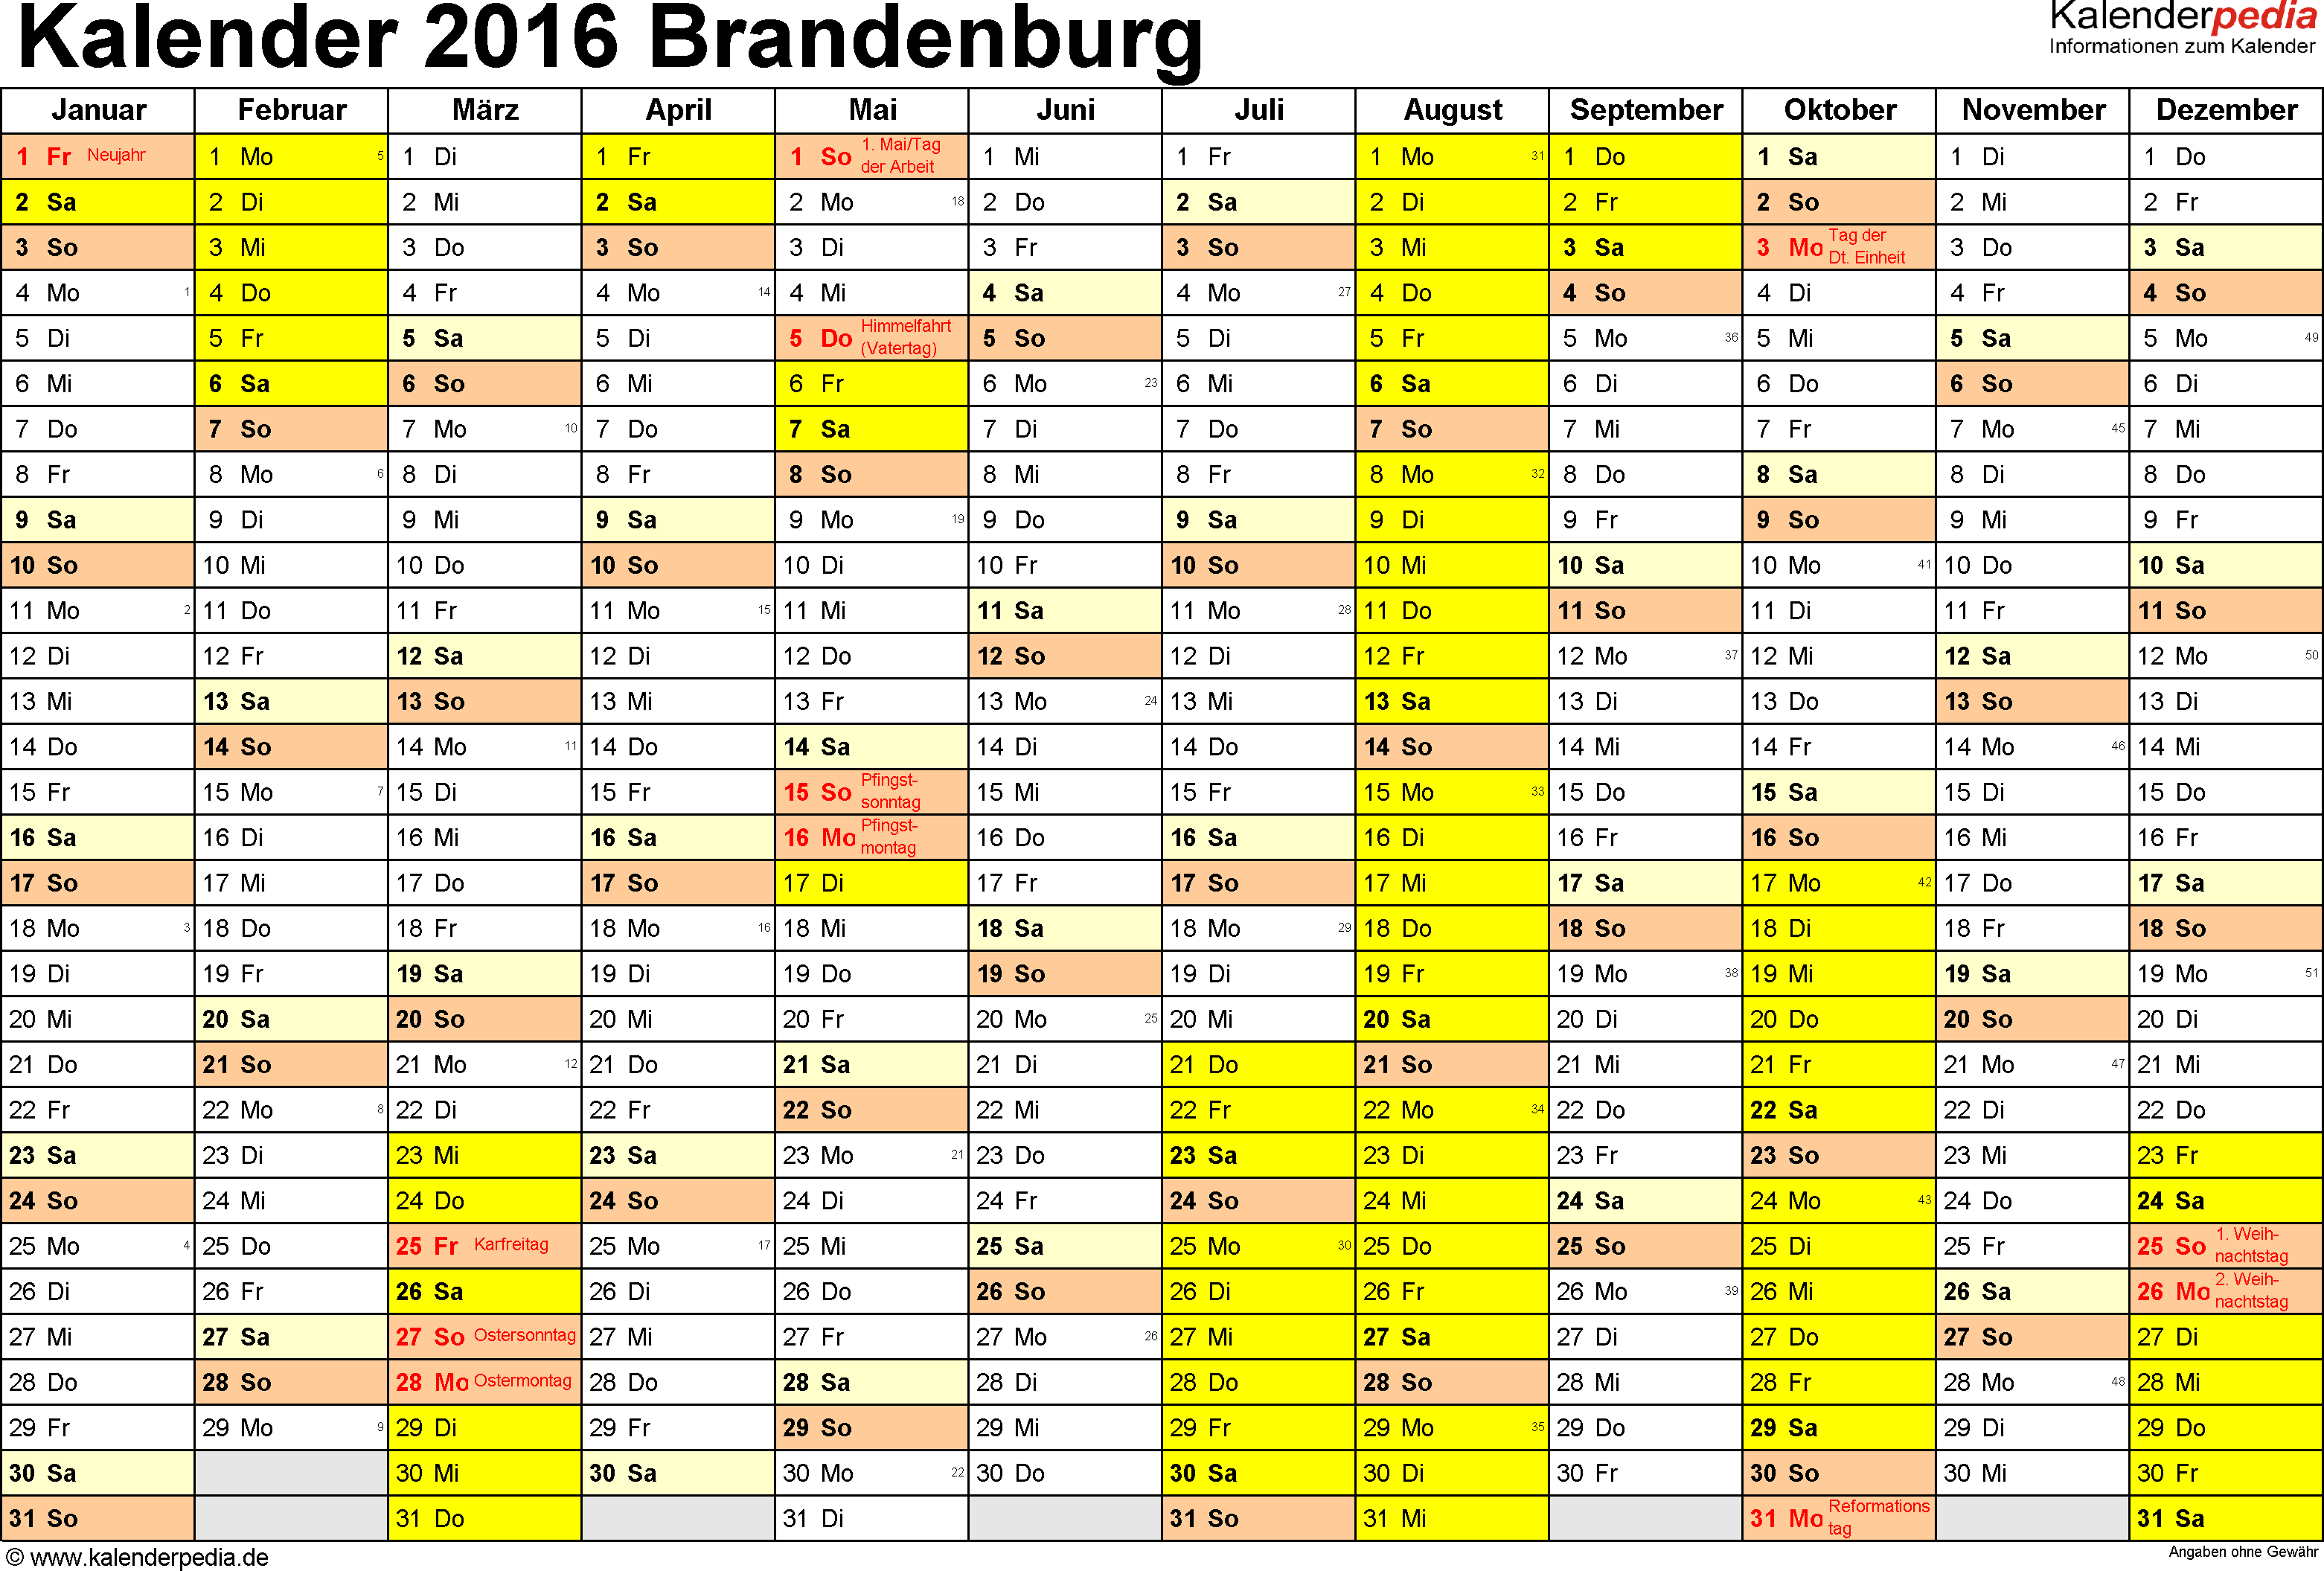 Kalender 2016 Brandenburg